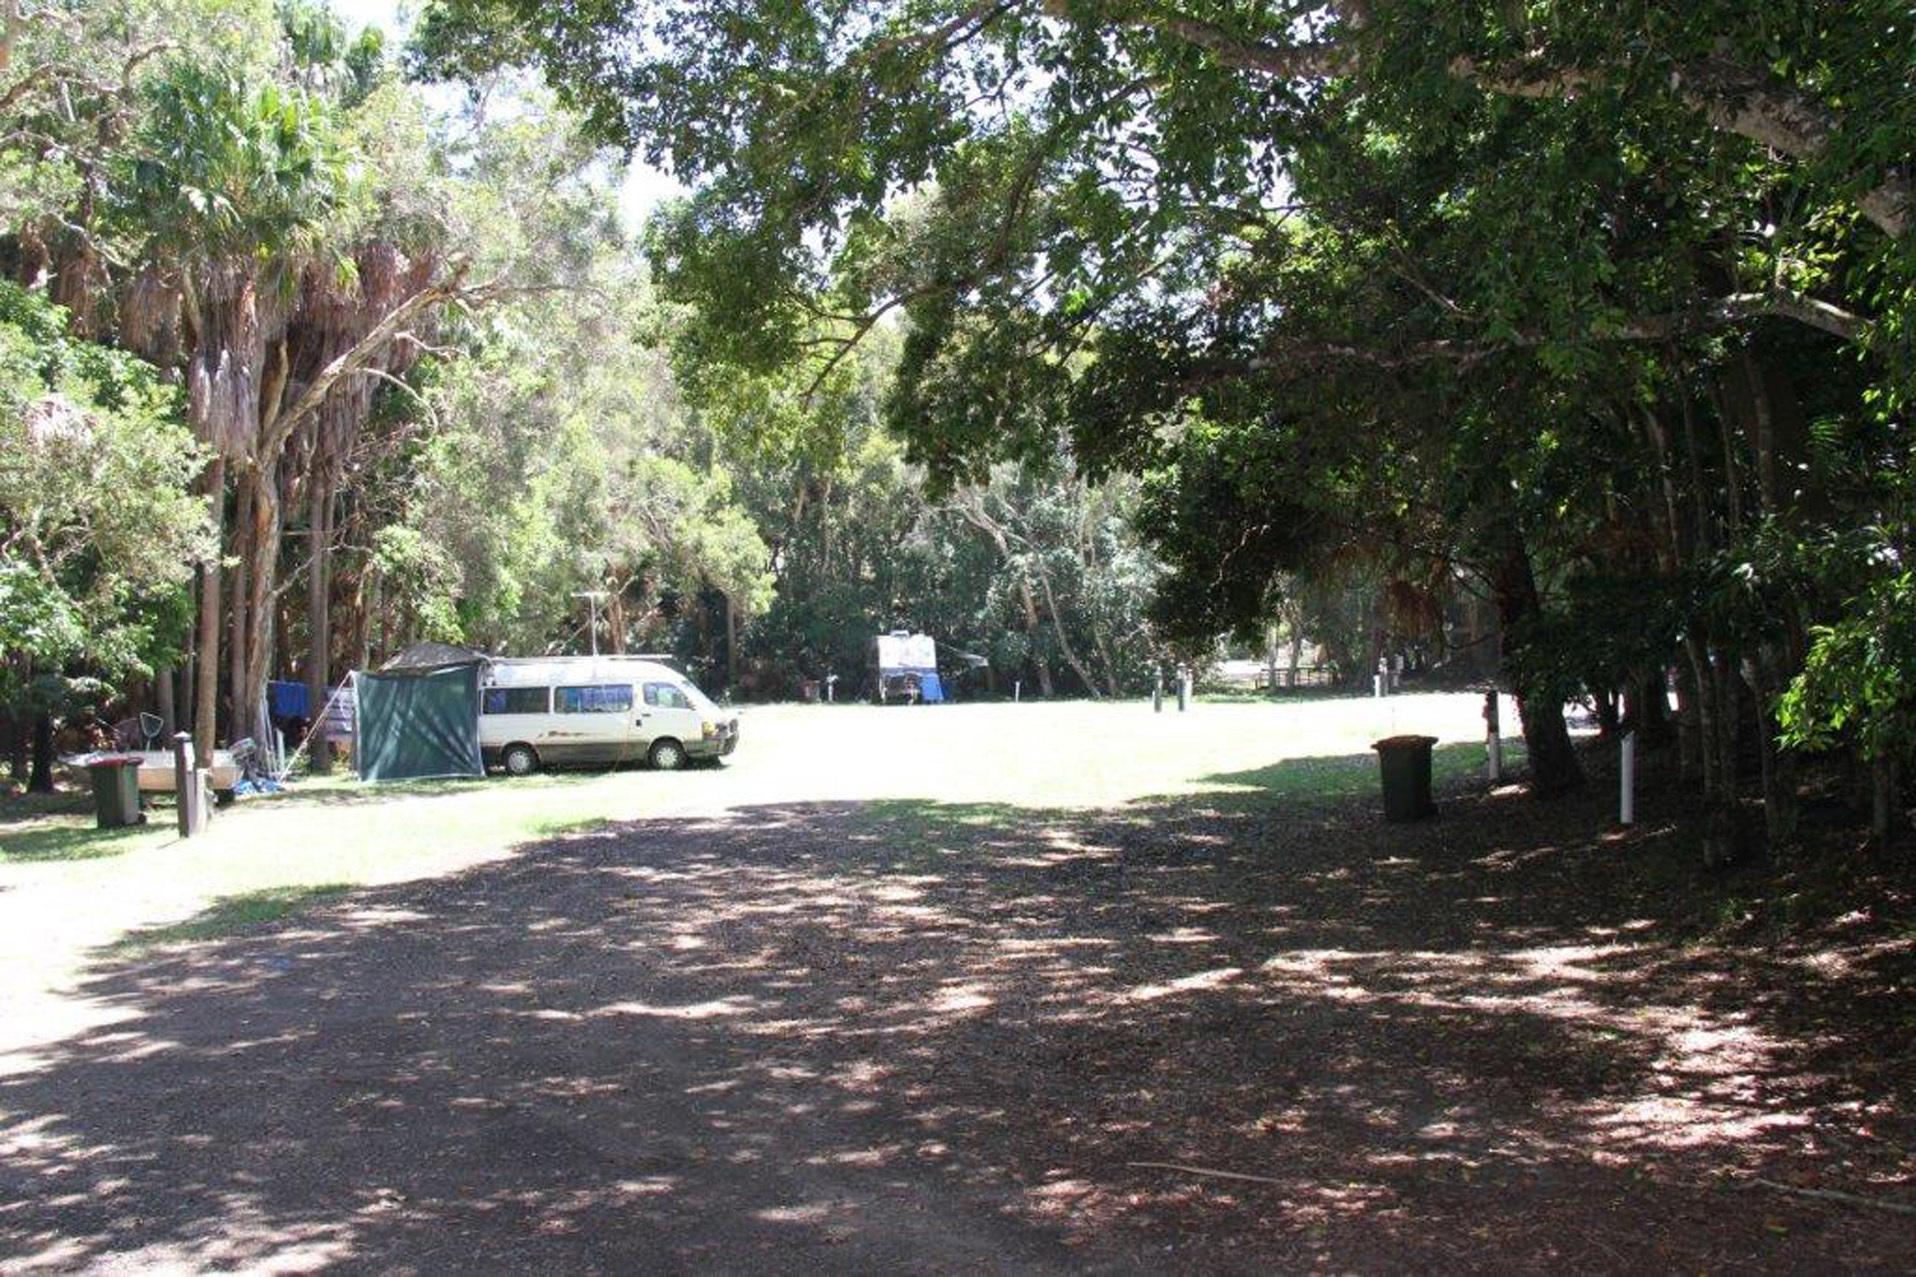 h - Tiona Palms Caravan Park